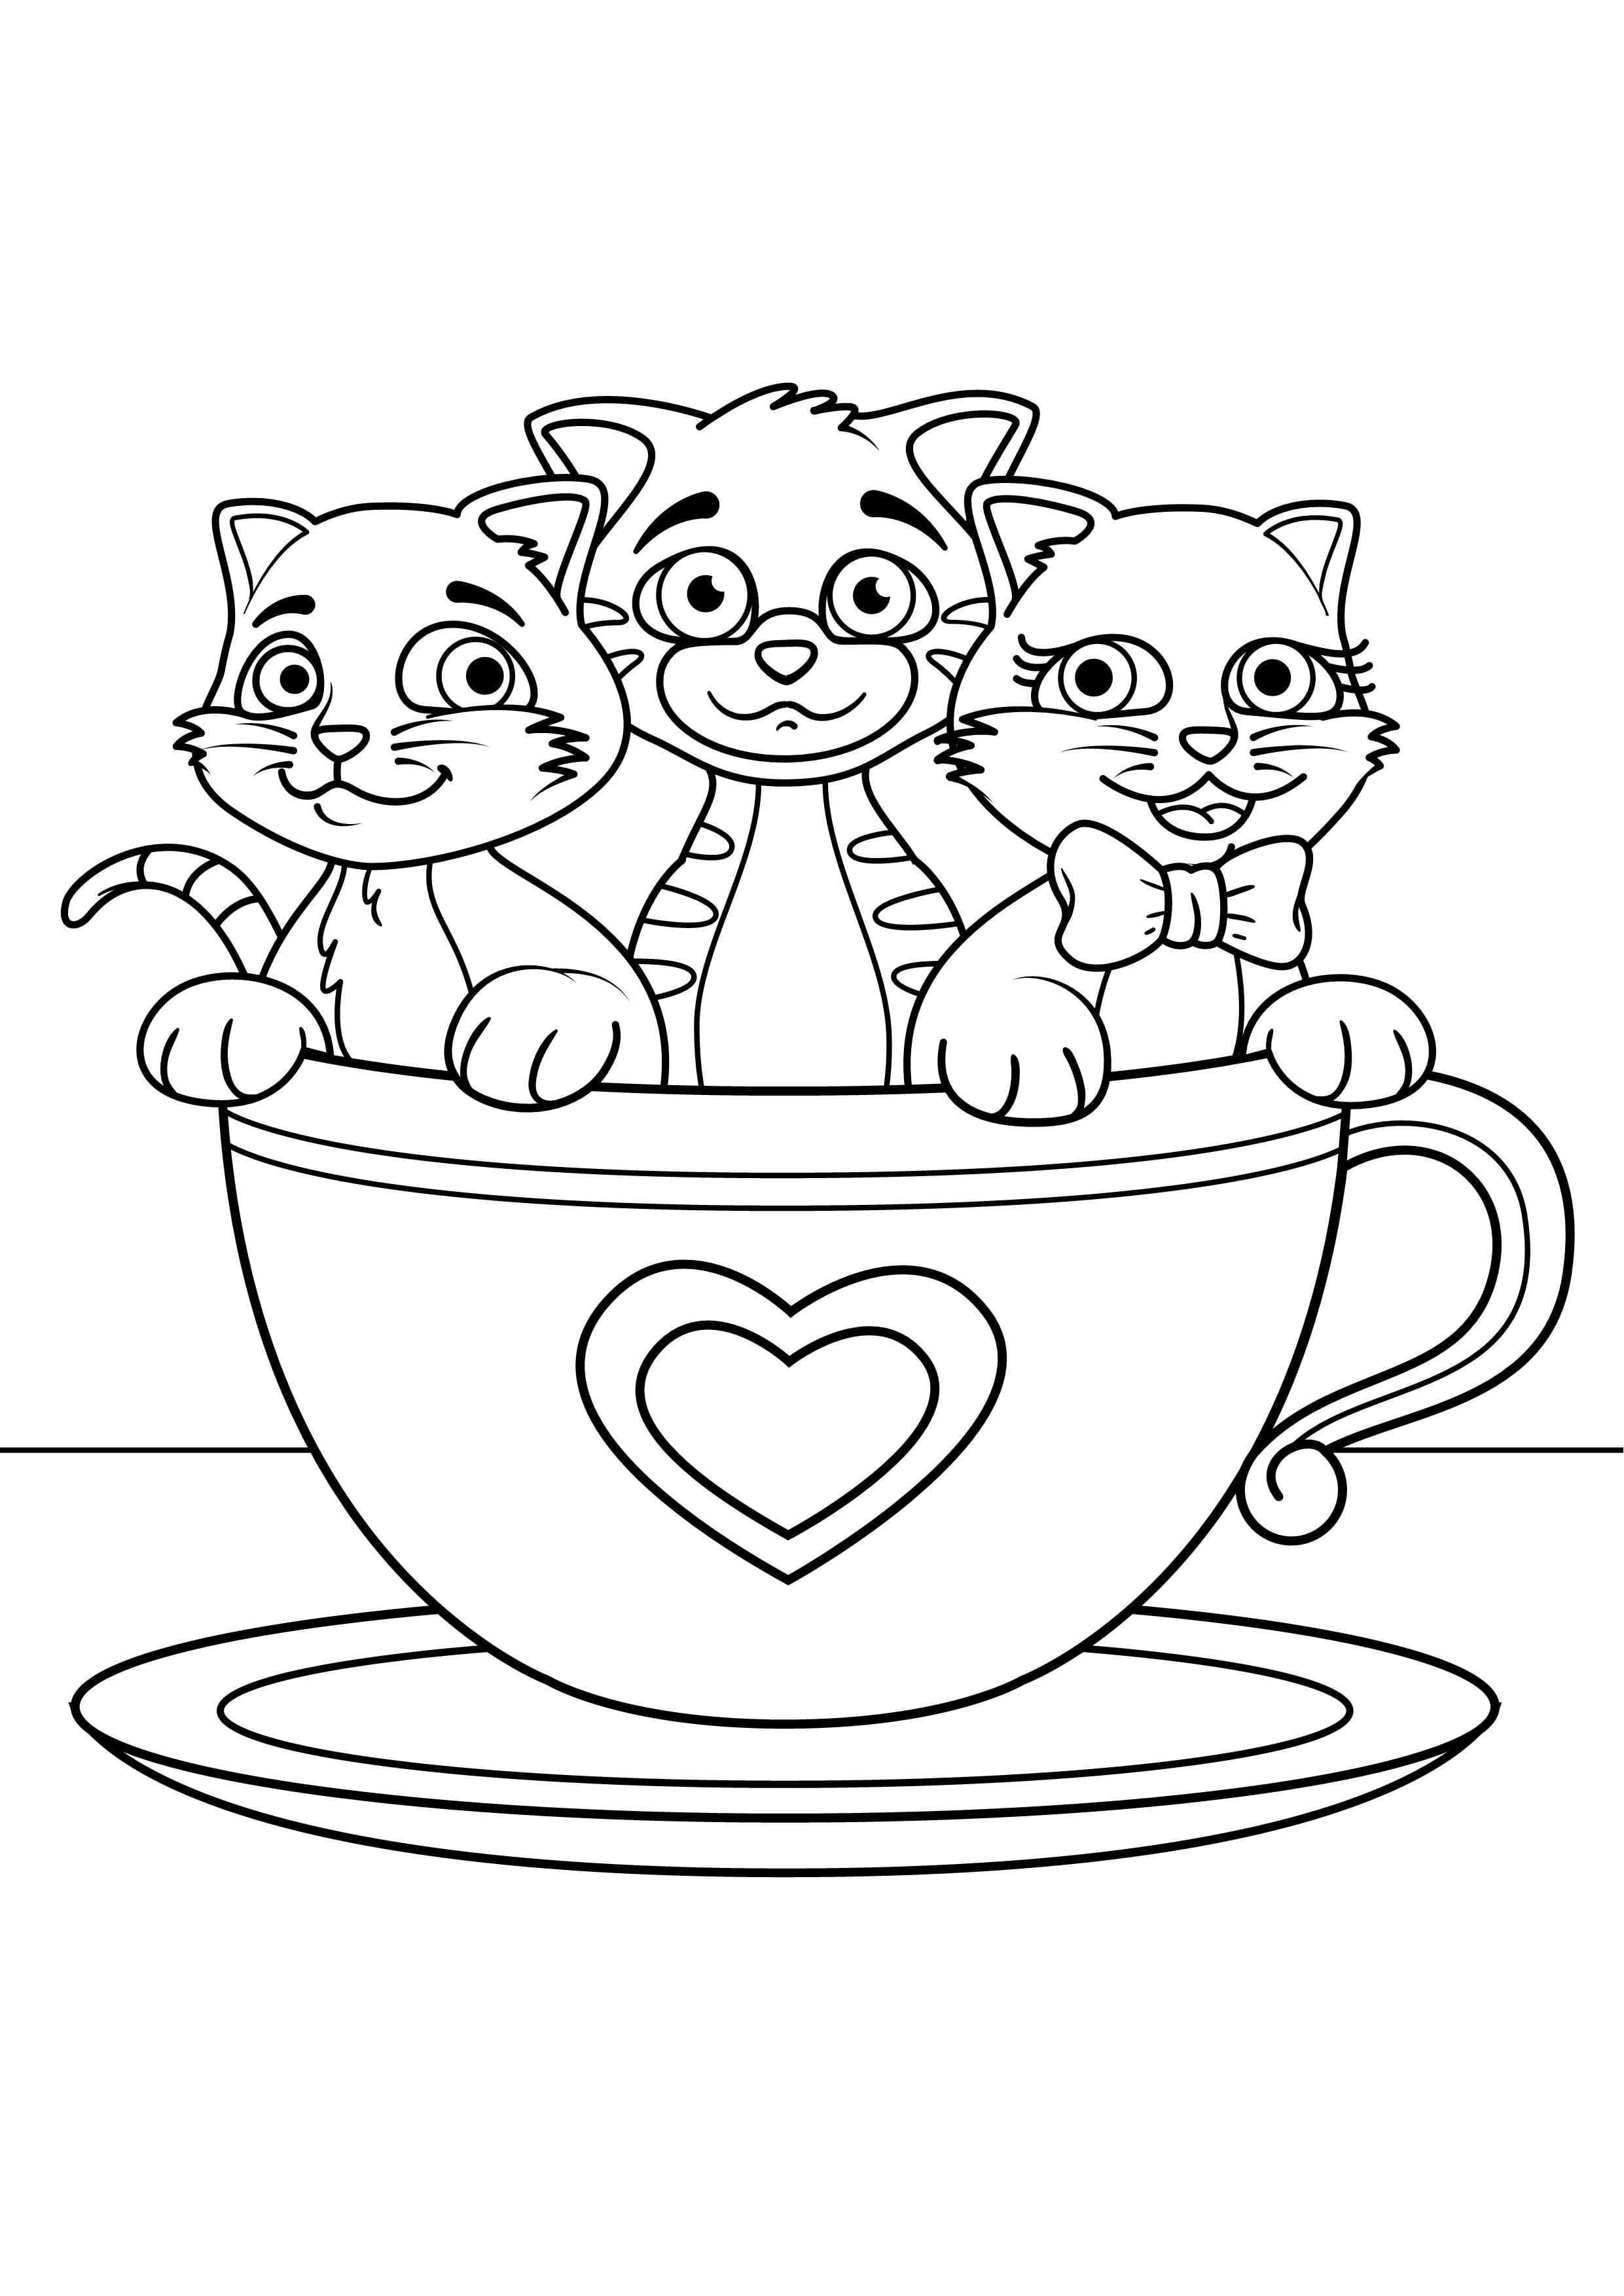 3 4 лет кошка раскраски детей - Рисовака